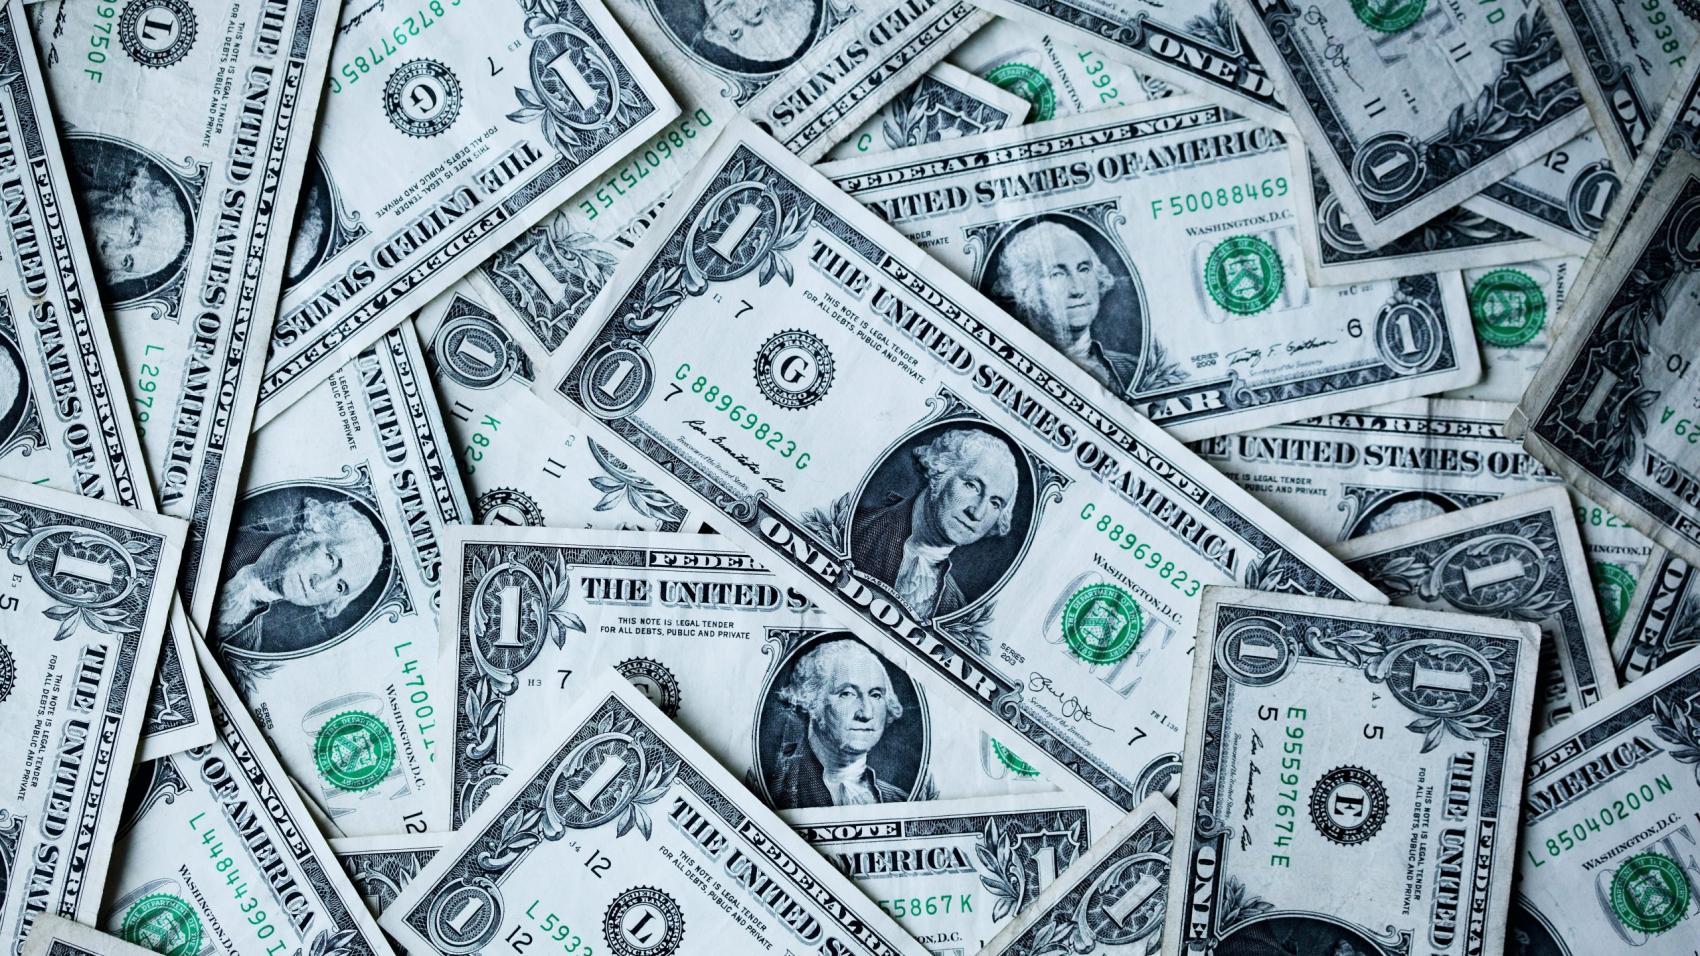 1 U.S.A dollar banknotes